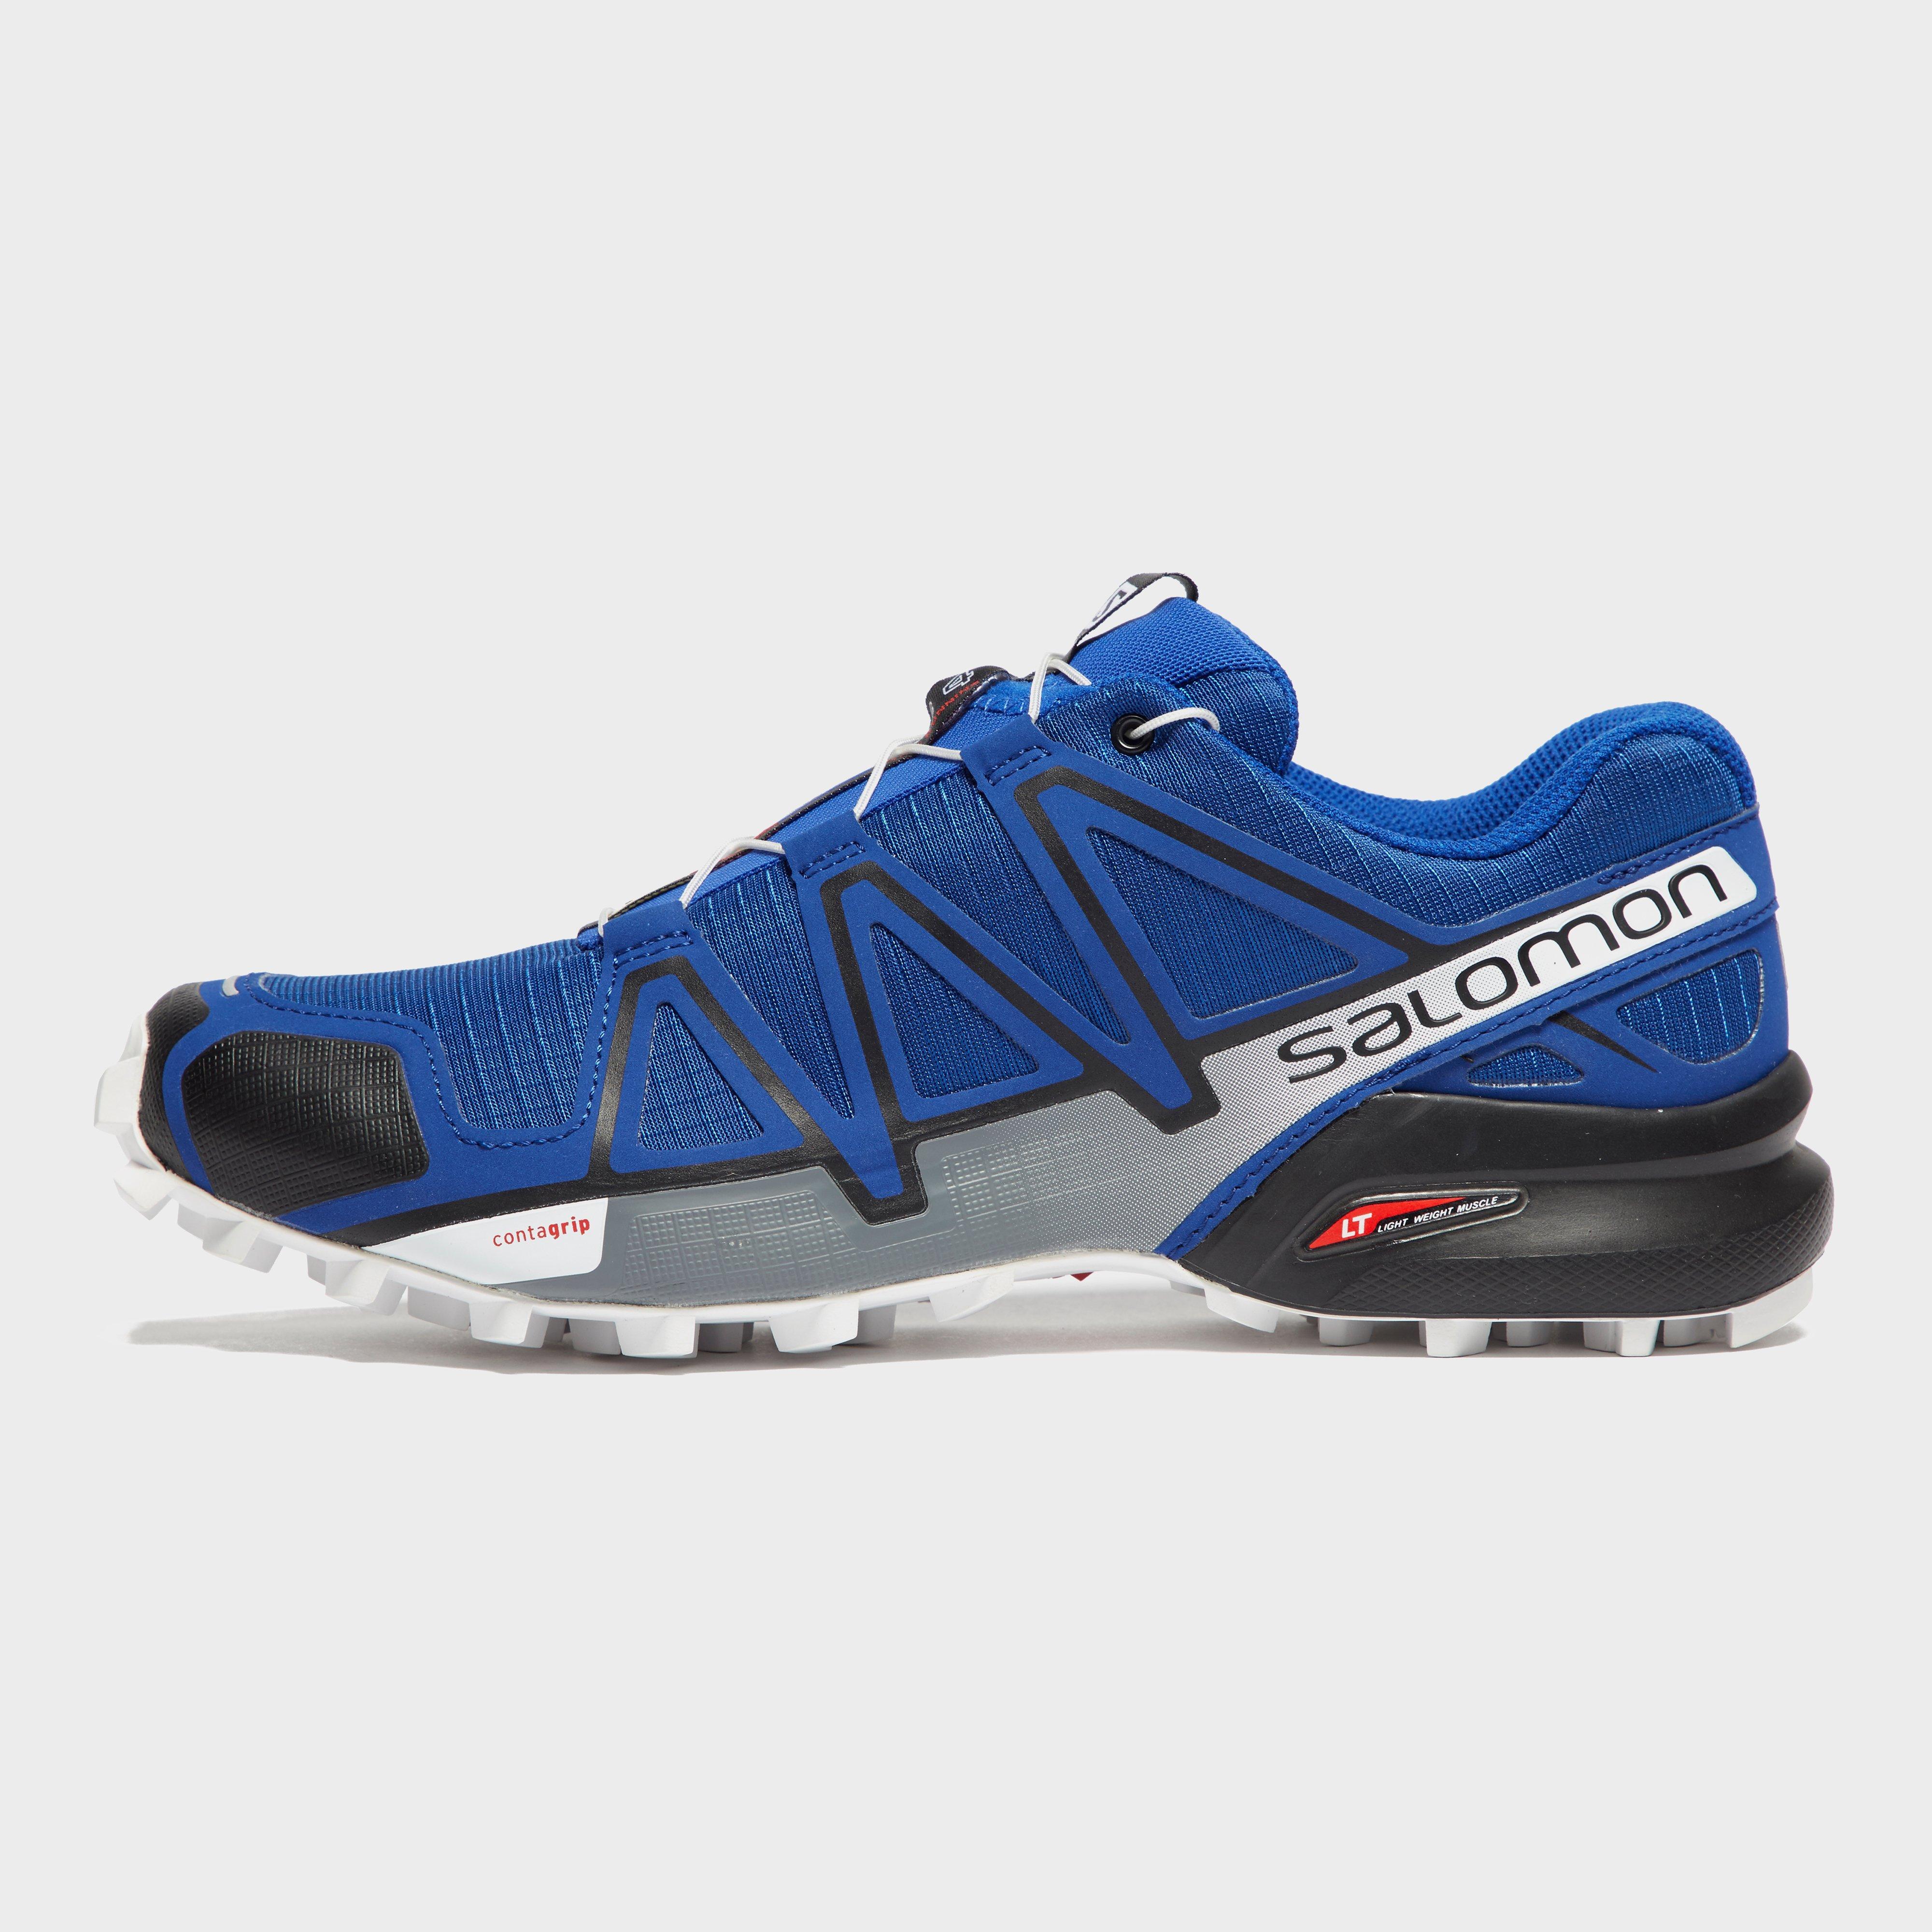 timeless design c2ae0 a648c Salomon Men s Speedcross 4 Trail Running Shoes